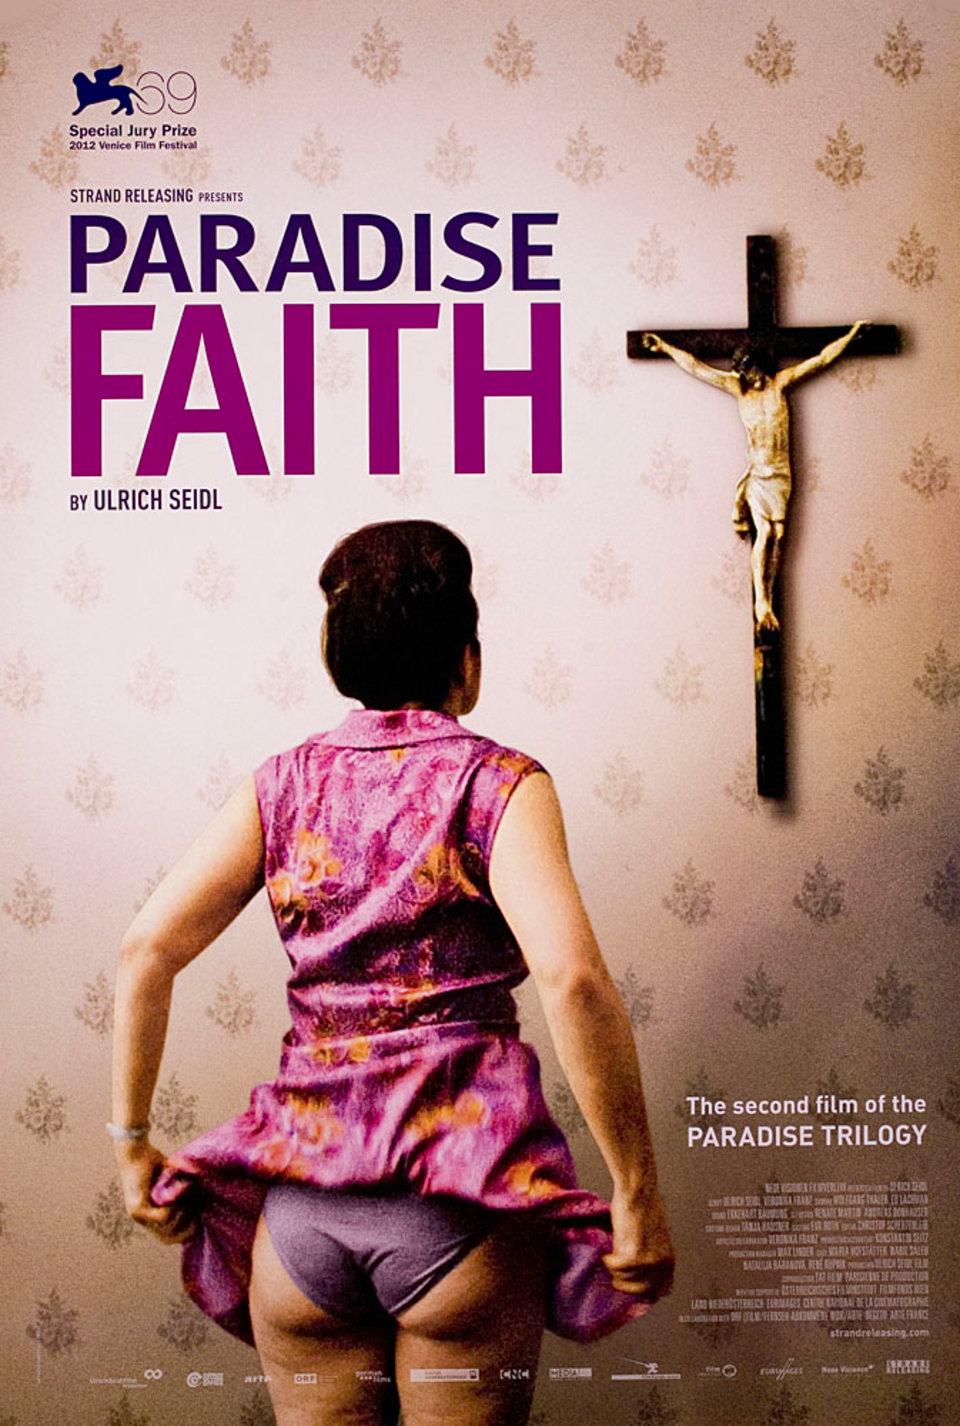 Paradise: Faith 2012 U.S. One Sheet Poster